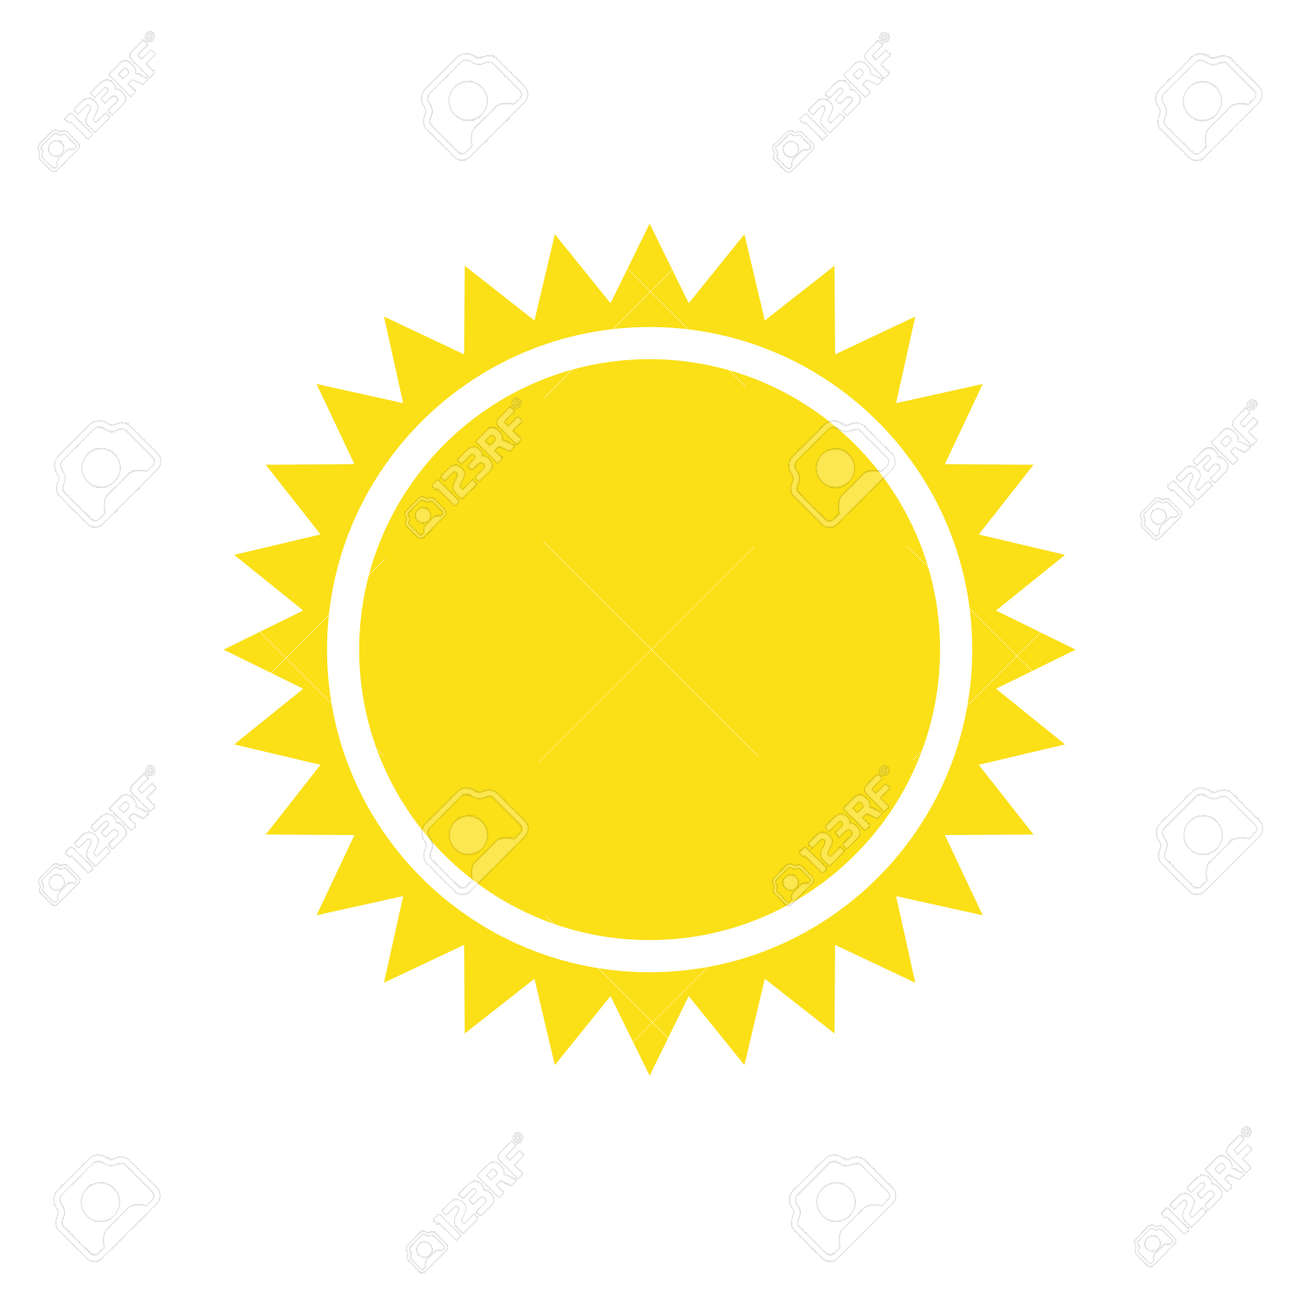 Yellow sun simple flat icon - 167363169